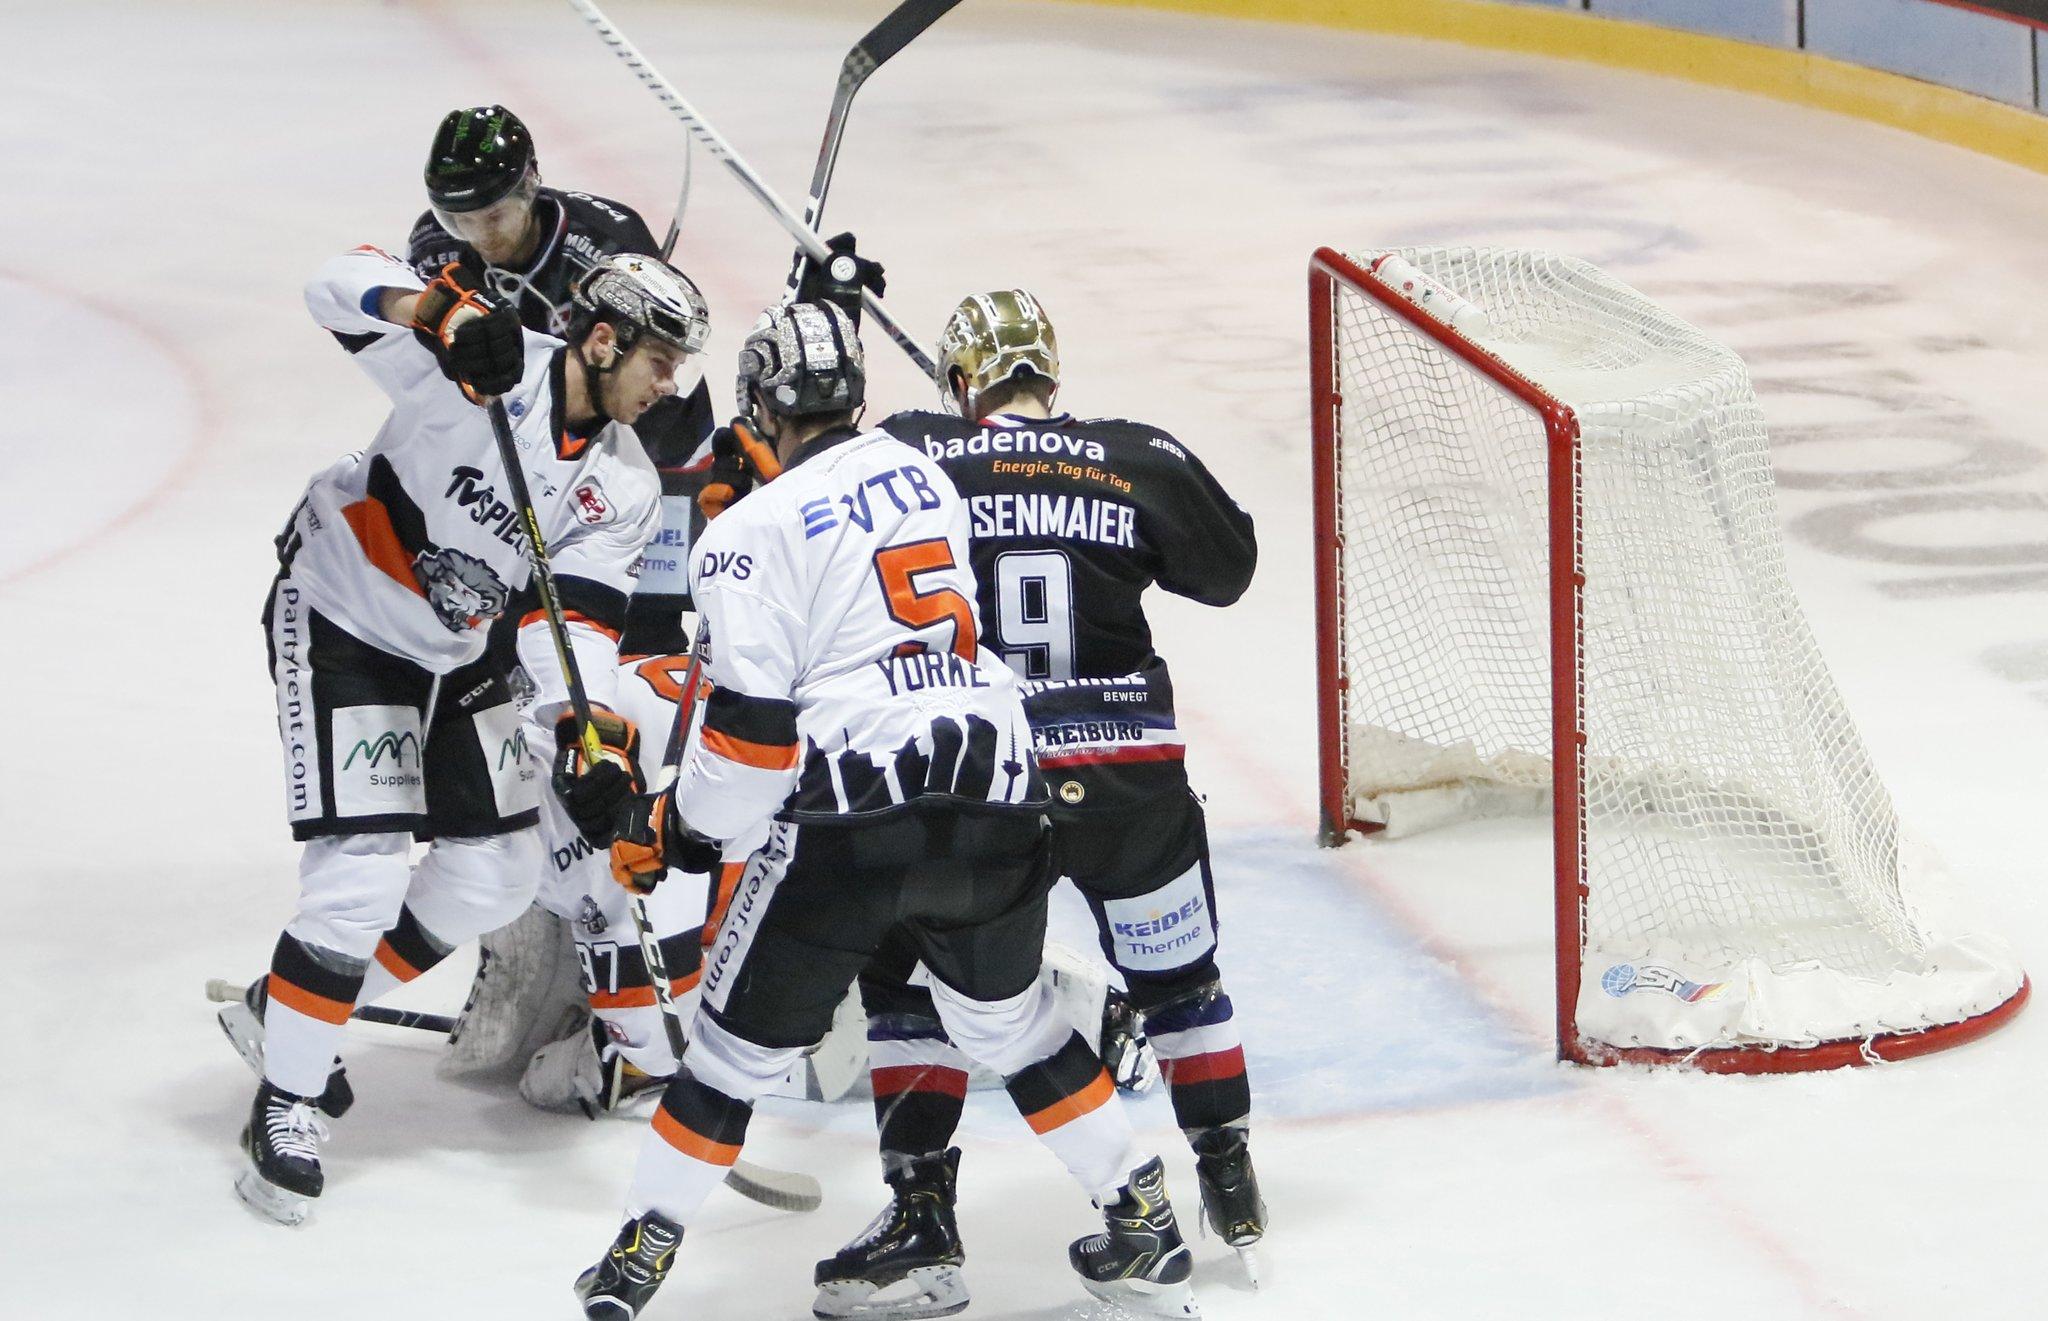 Eishockey Frankfurt Heute